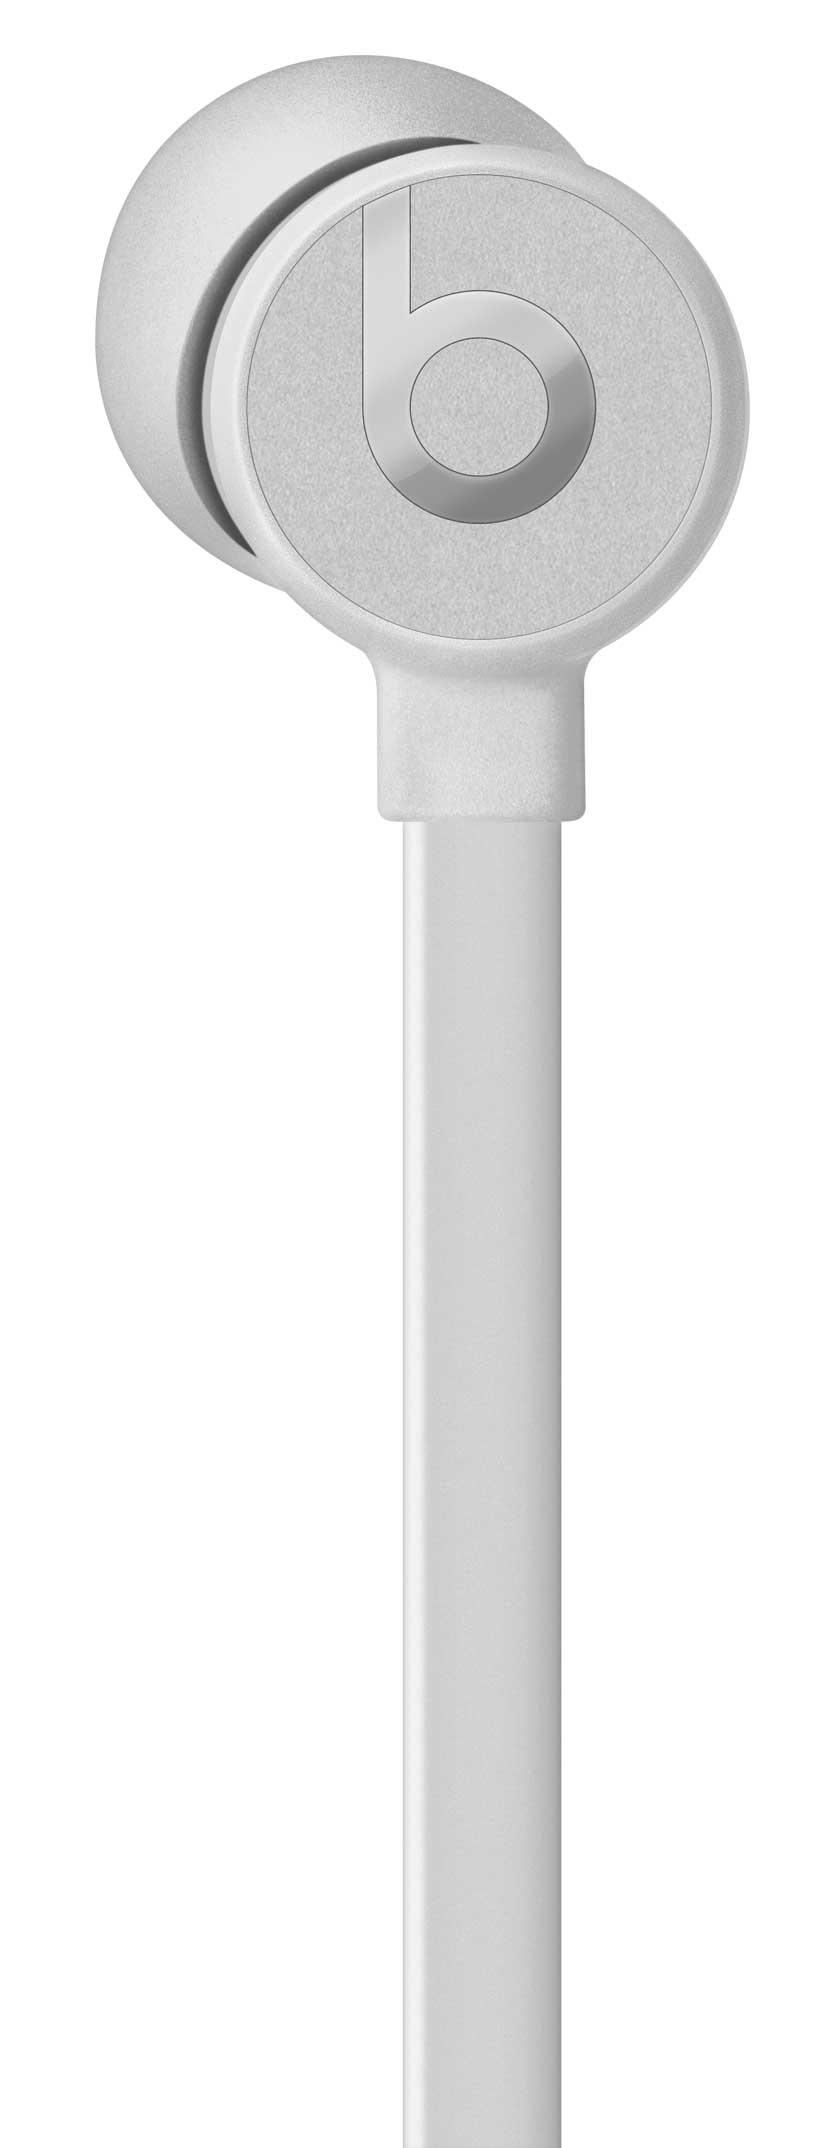 urBeats3 Earphones with Lightning Connector $29